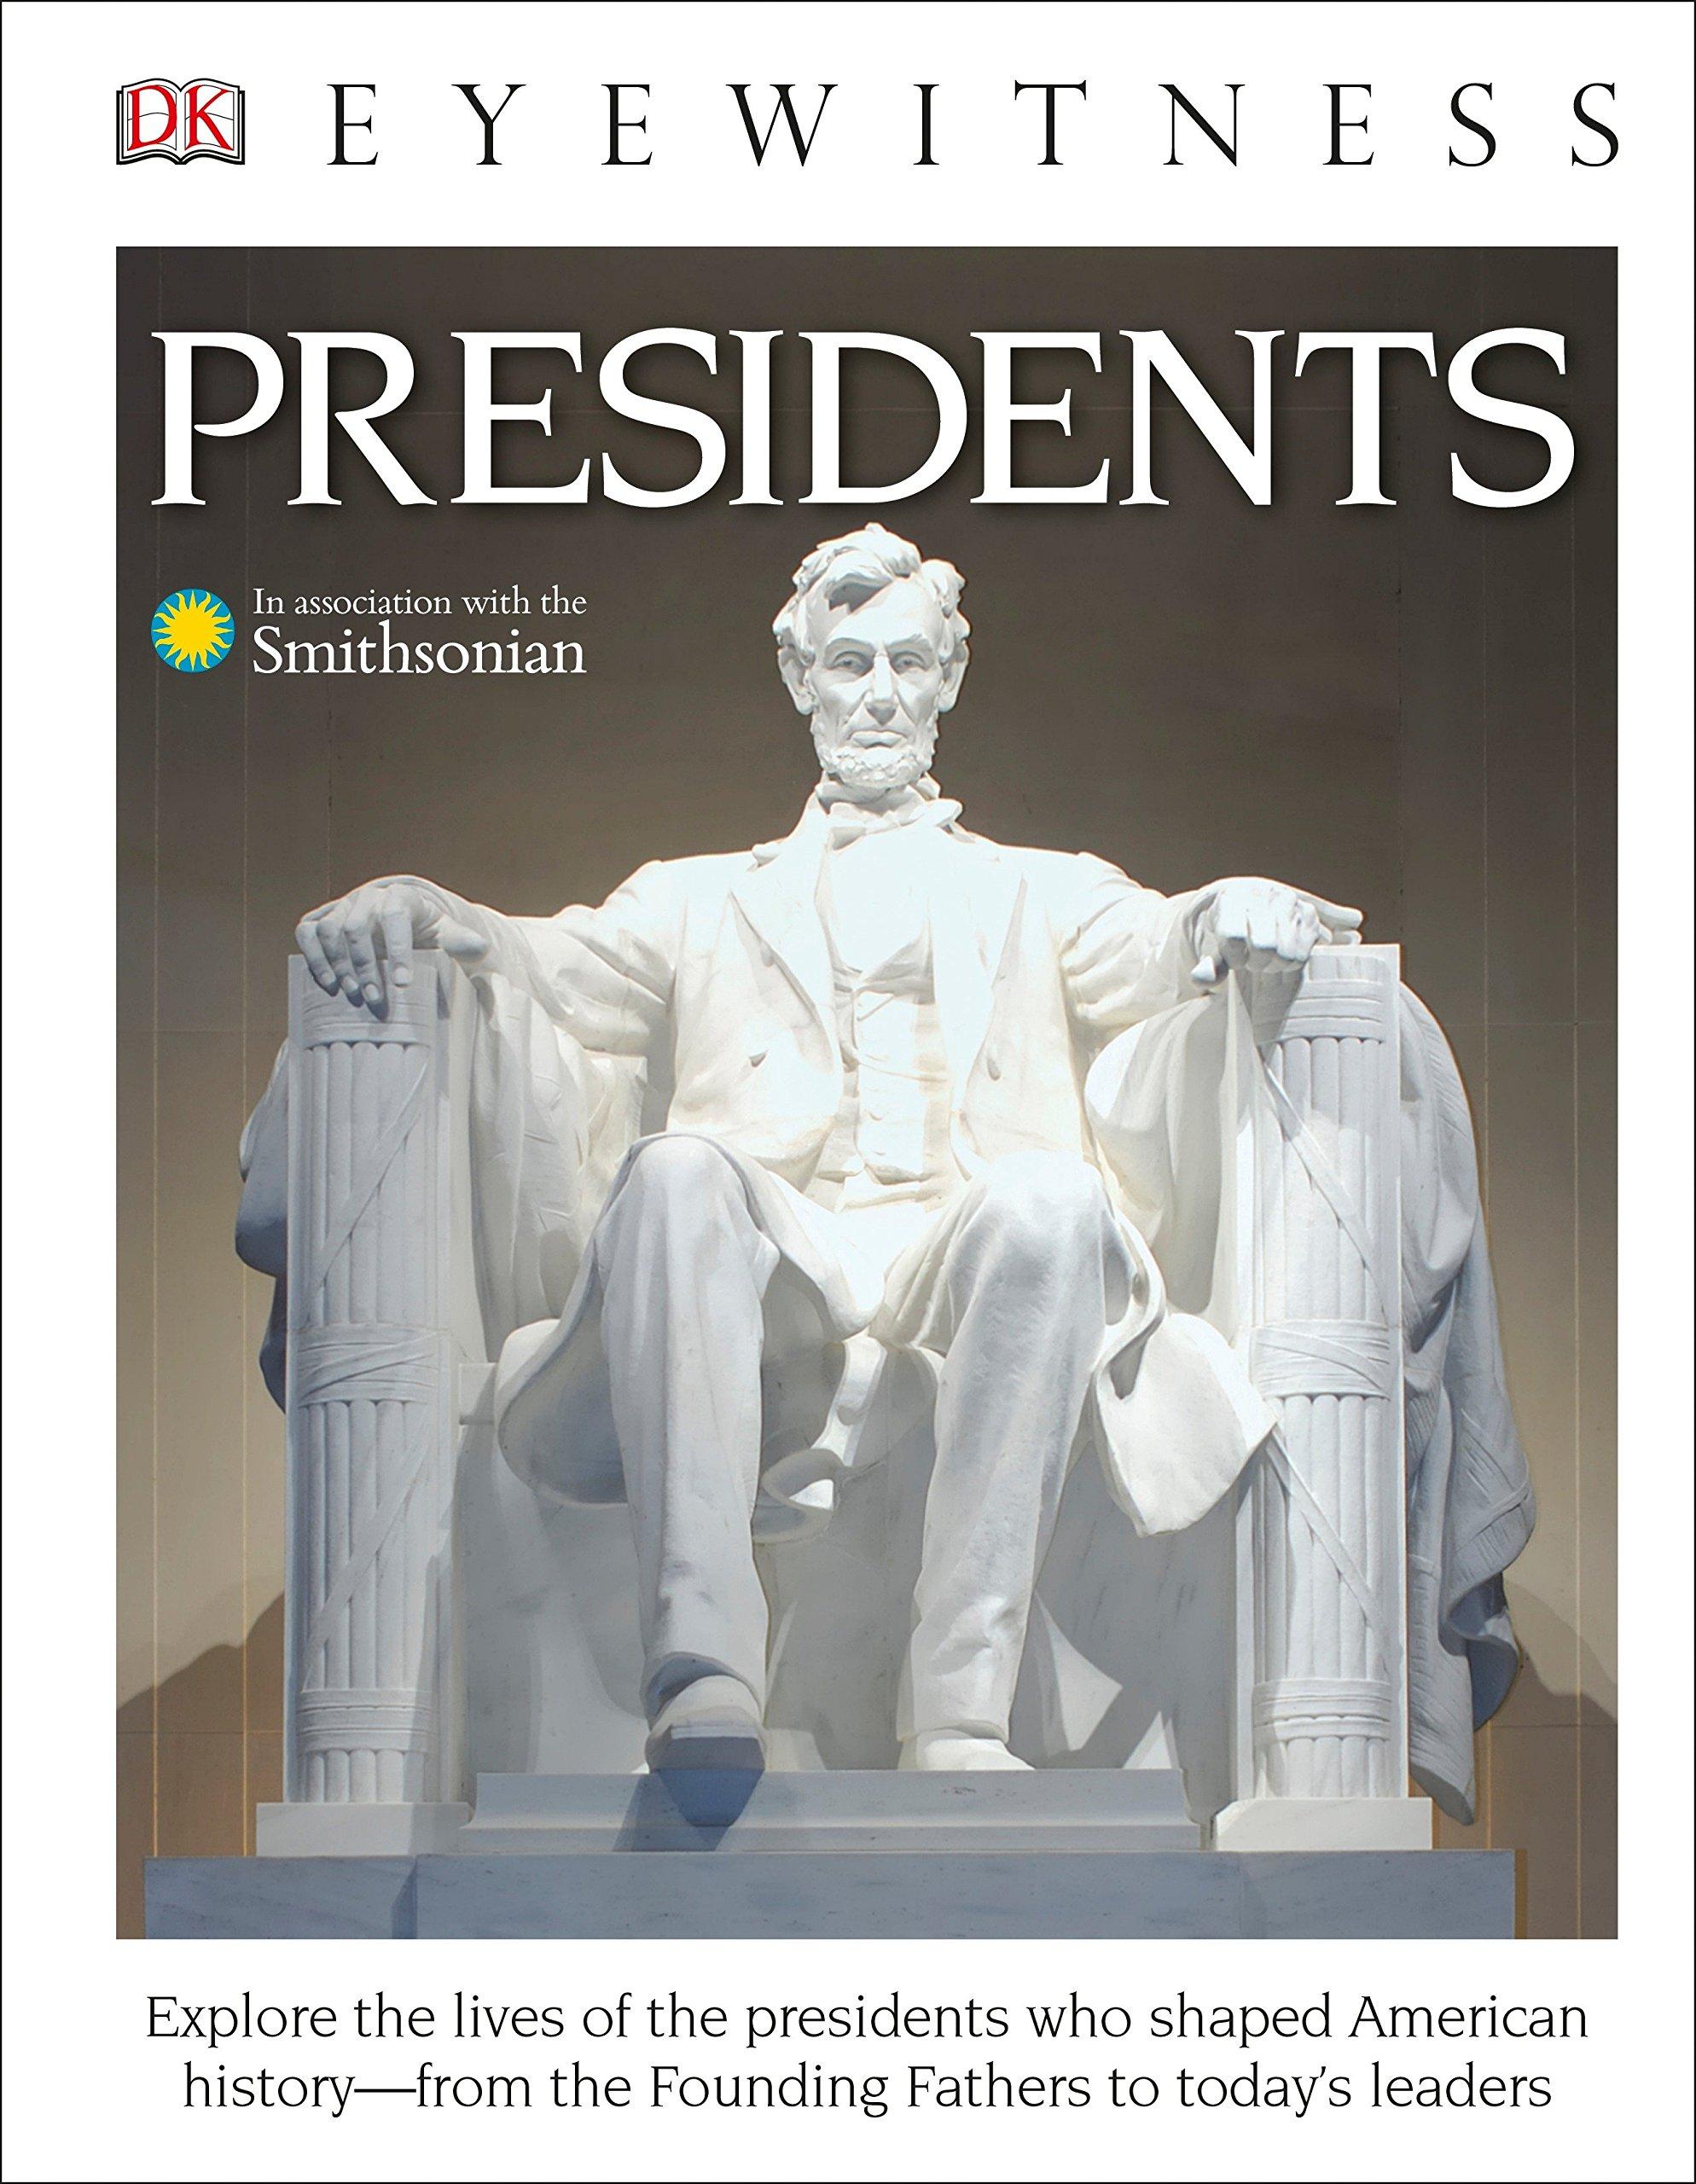 DK Eyewitness Books: Presidents (Library Edition)